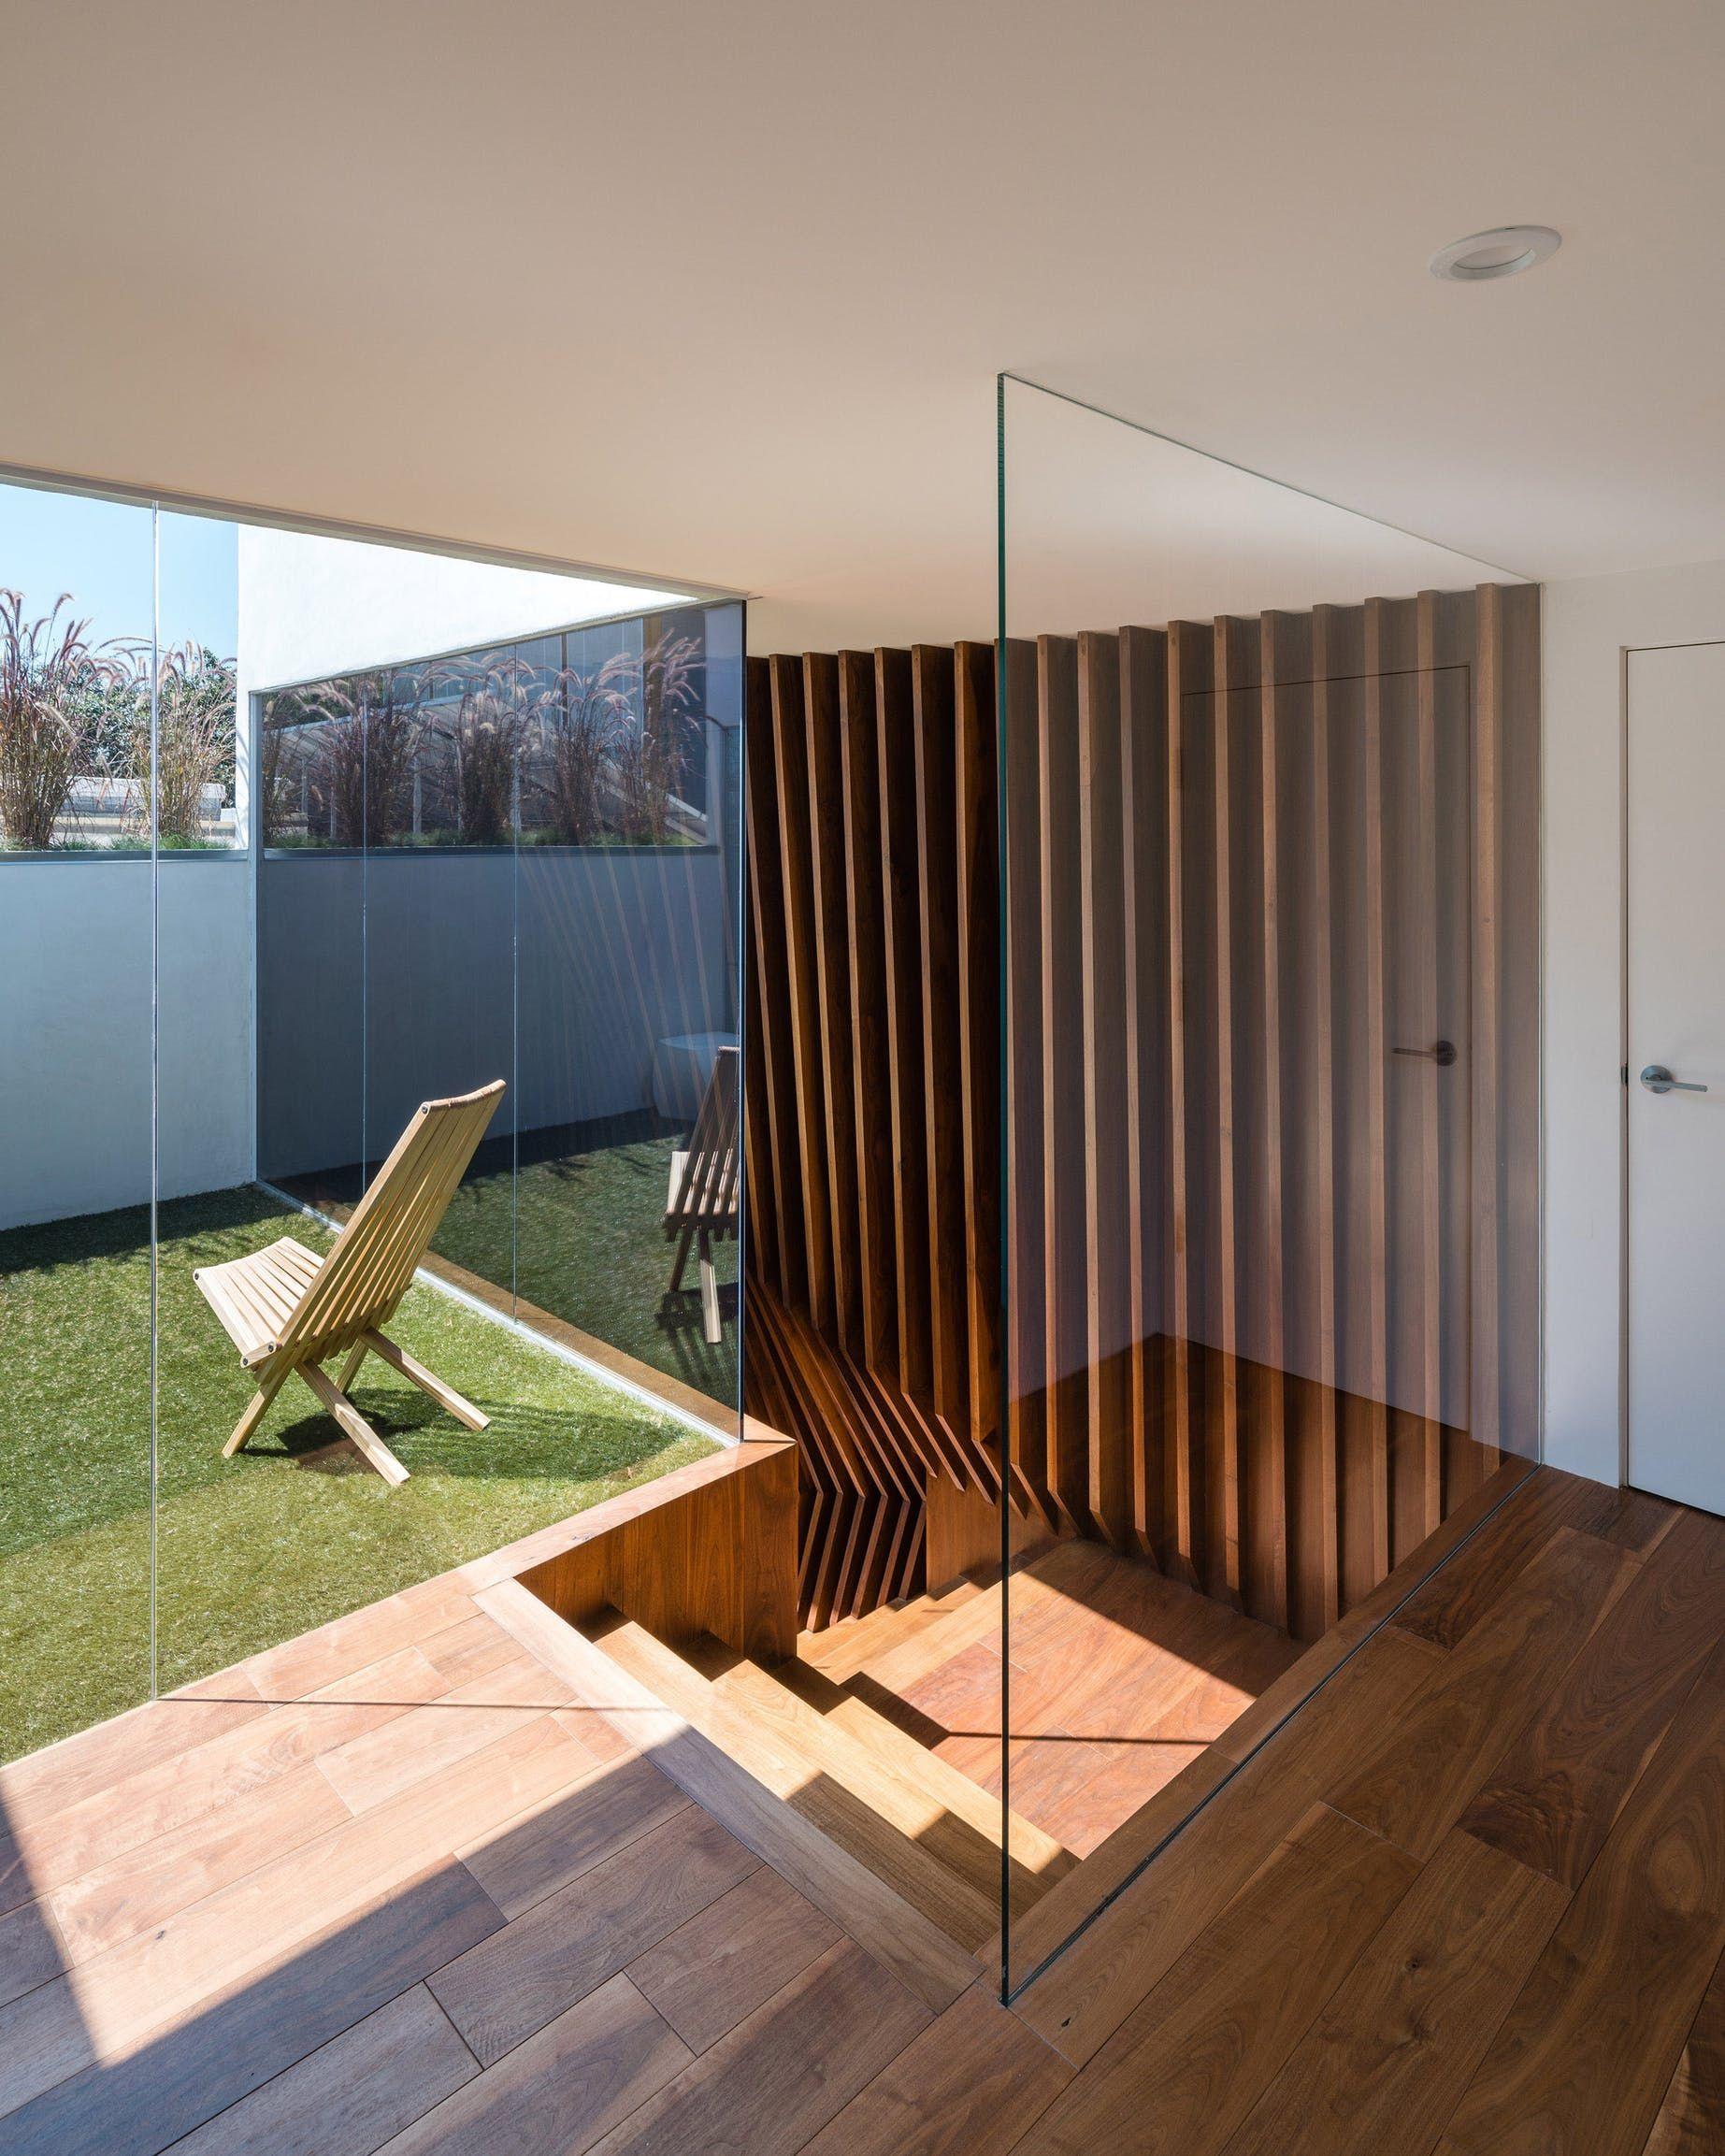 Los Angeles Based Architect Dan Brunn Aia Principal Of Dan Brunn  # Muebles Dummy Medellin